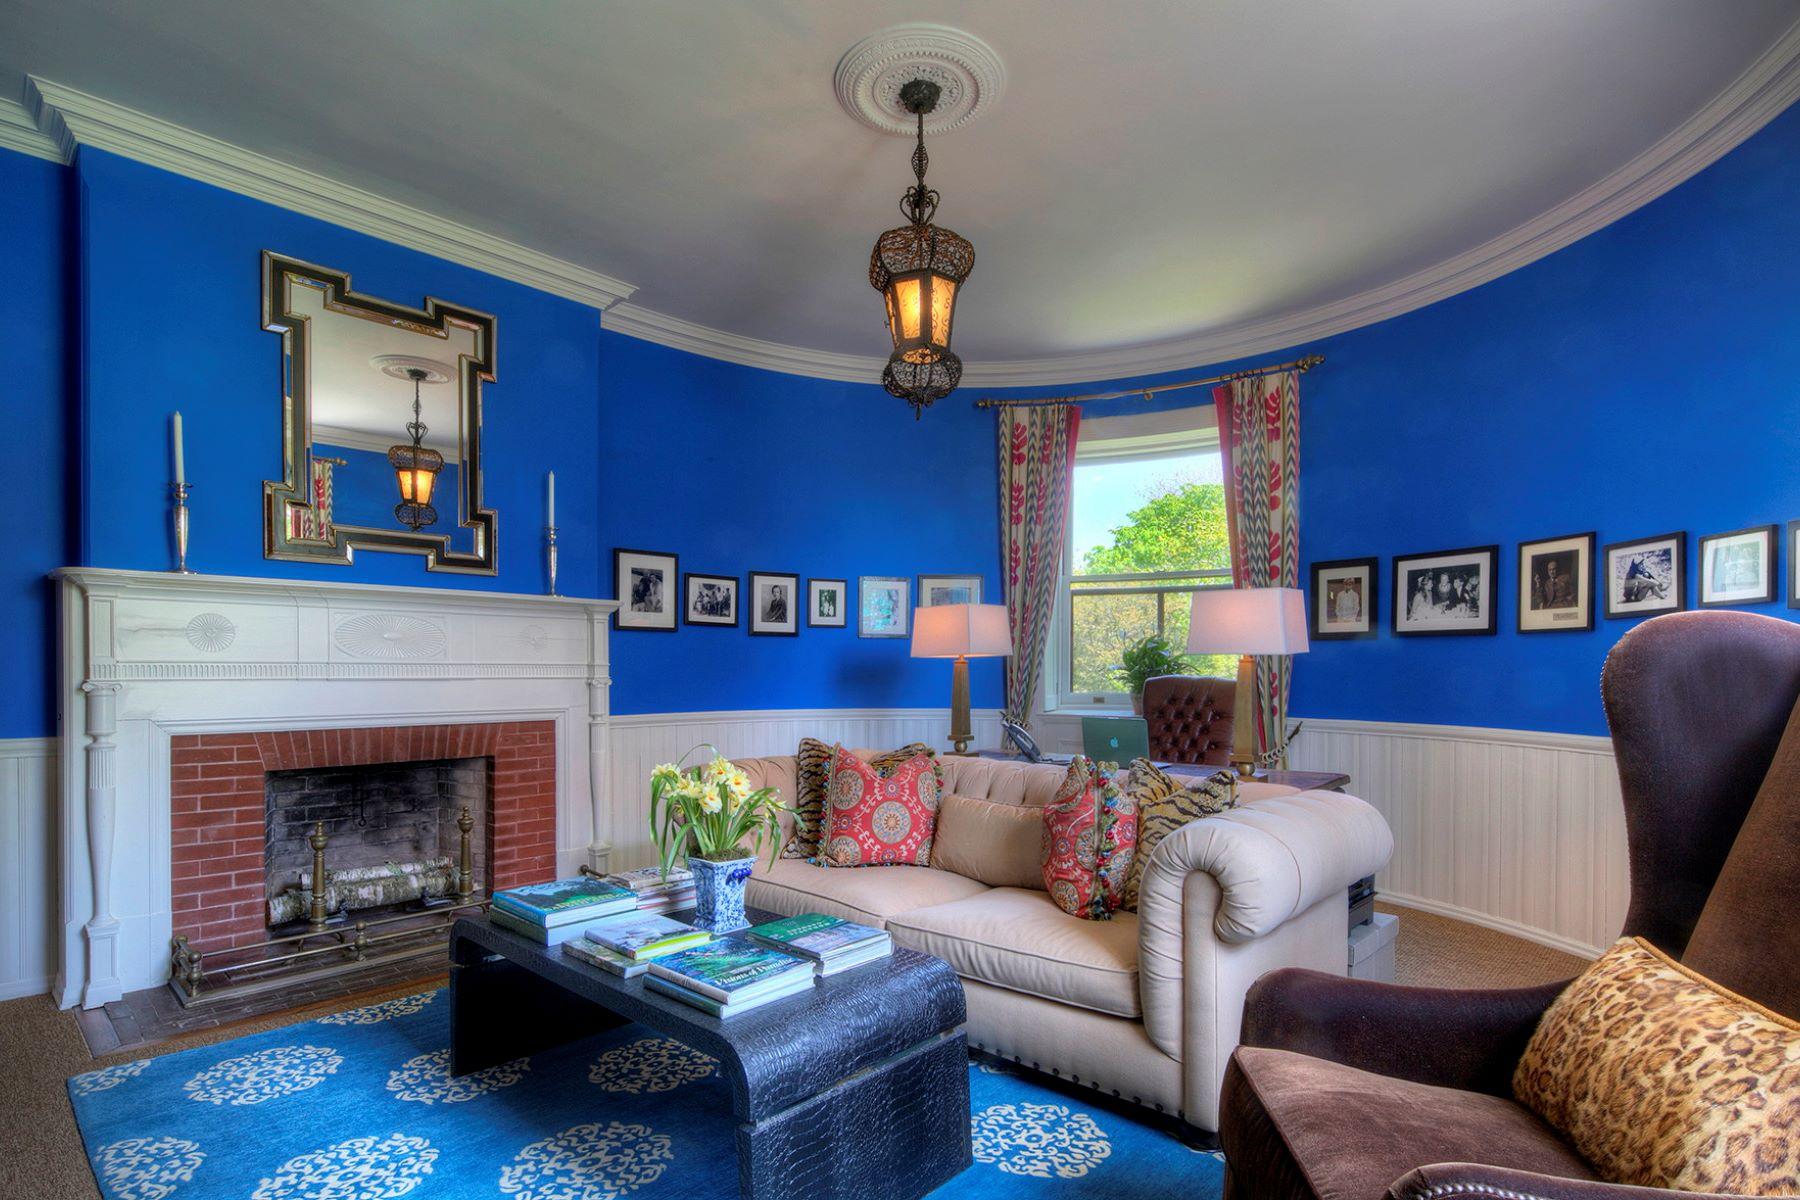 Additional photo for property listing at Wild Moor Estate 21 Hammersmith Road 纽波特, 罗得岛 02840 美国